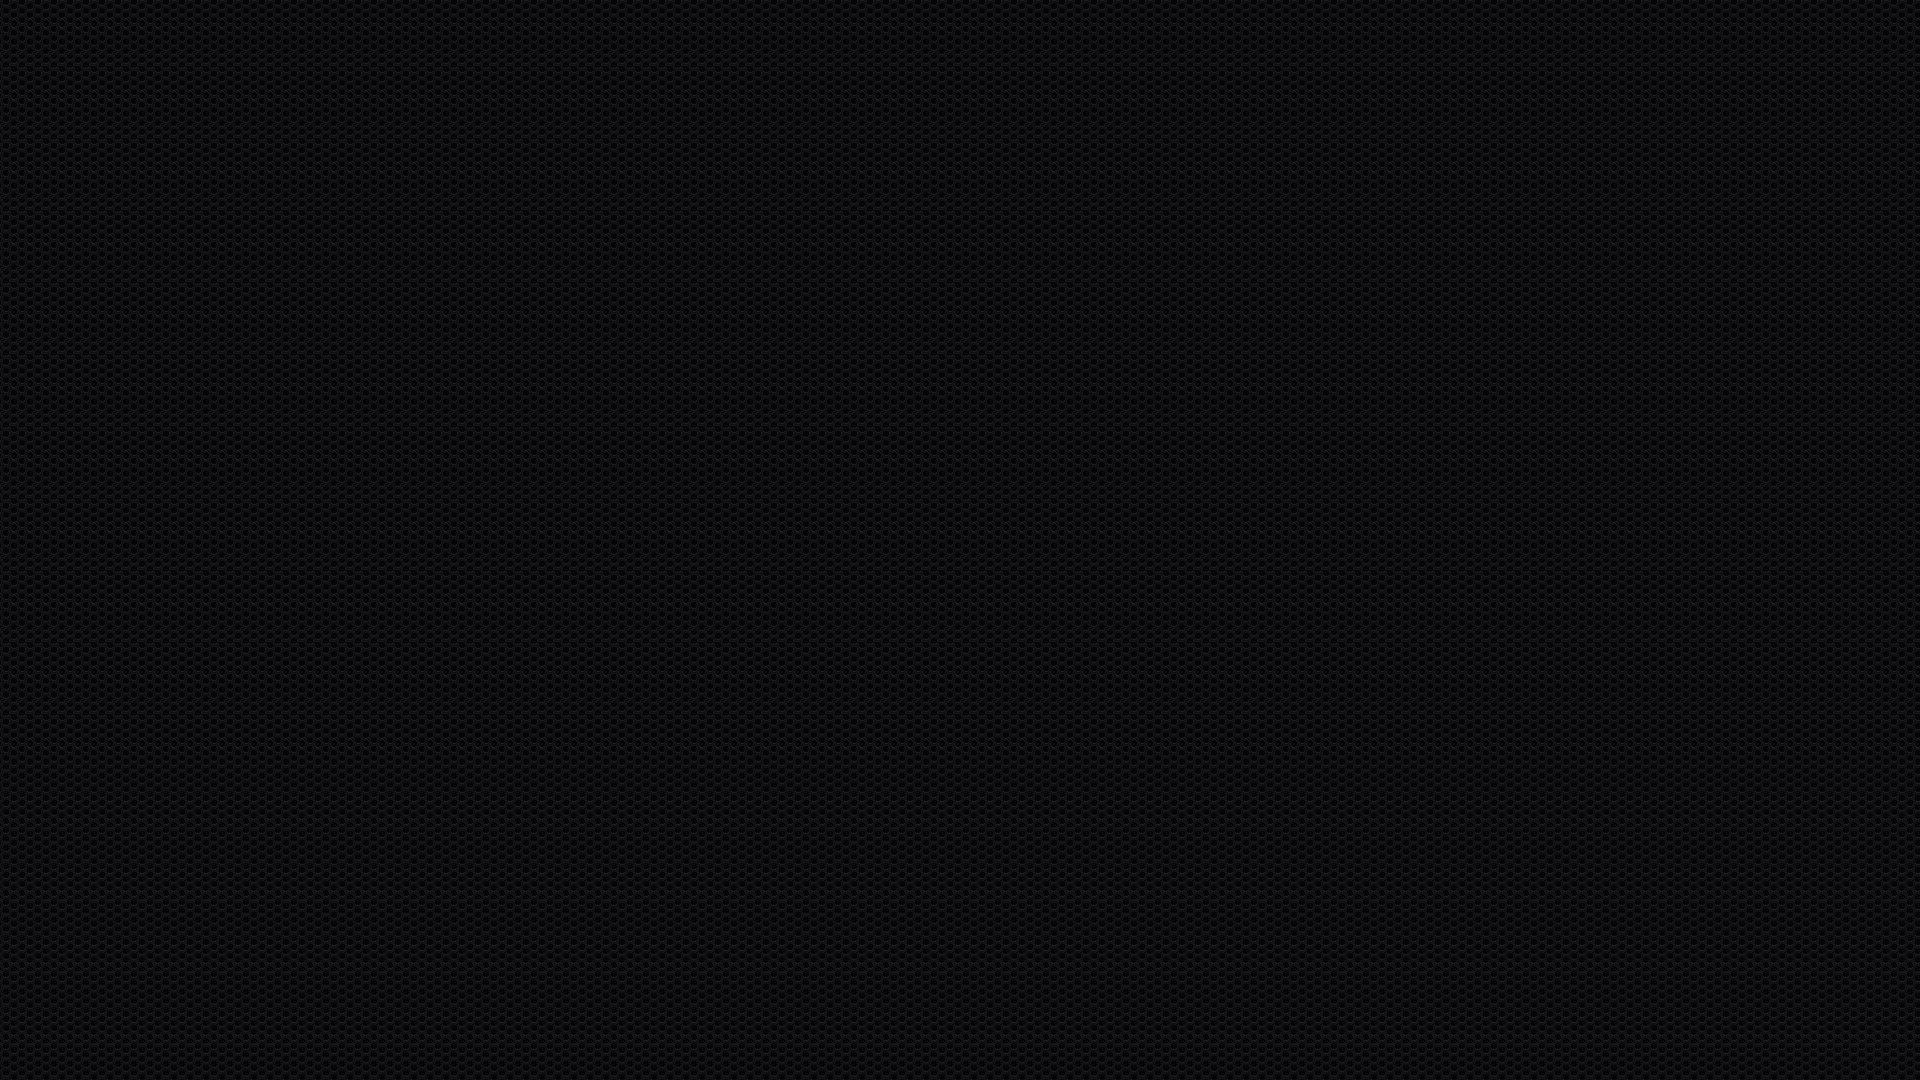 All- Black Wallpapers on WallpaperDog